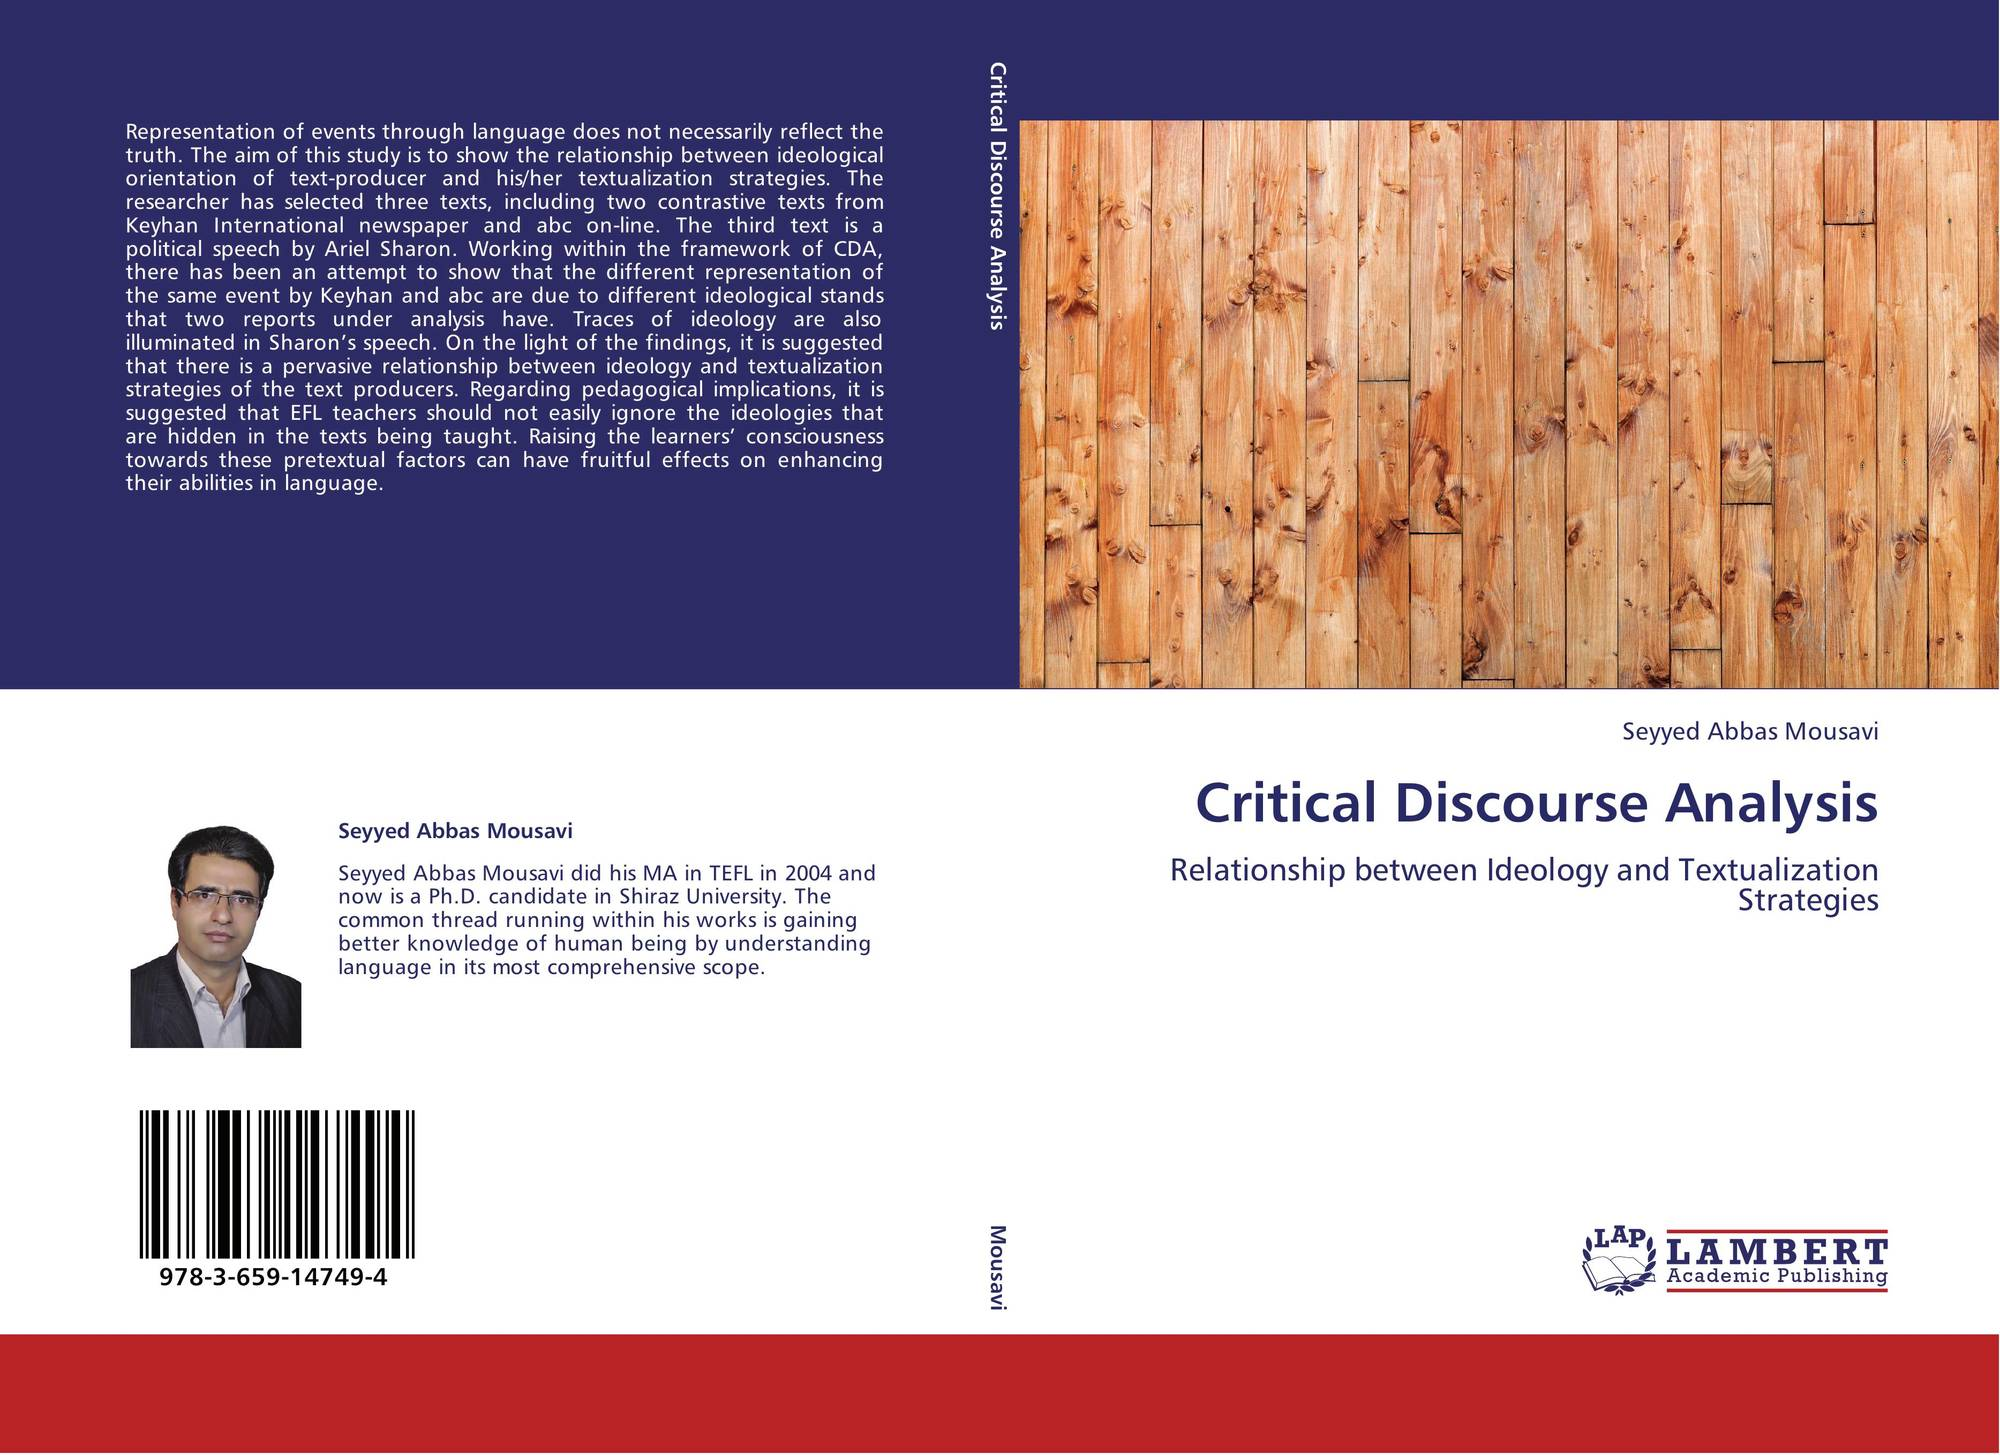 discourse analysis and political rhetoric politics essay A critical discourse analysis of goodluck nigerian politics the deployment of political rhetoric as discourse analysis and rhetorical strategies.